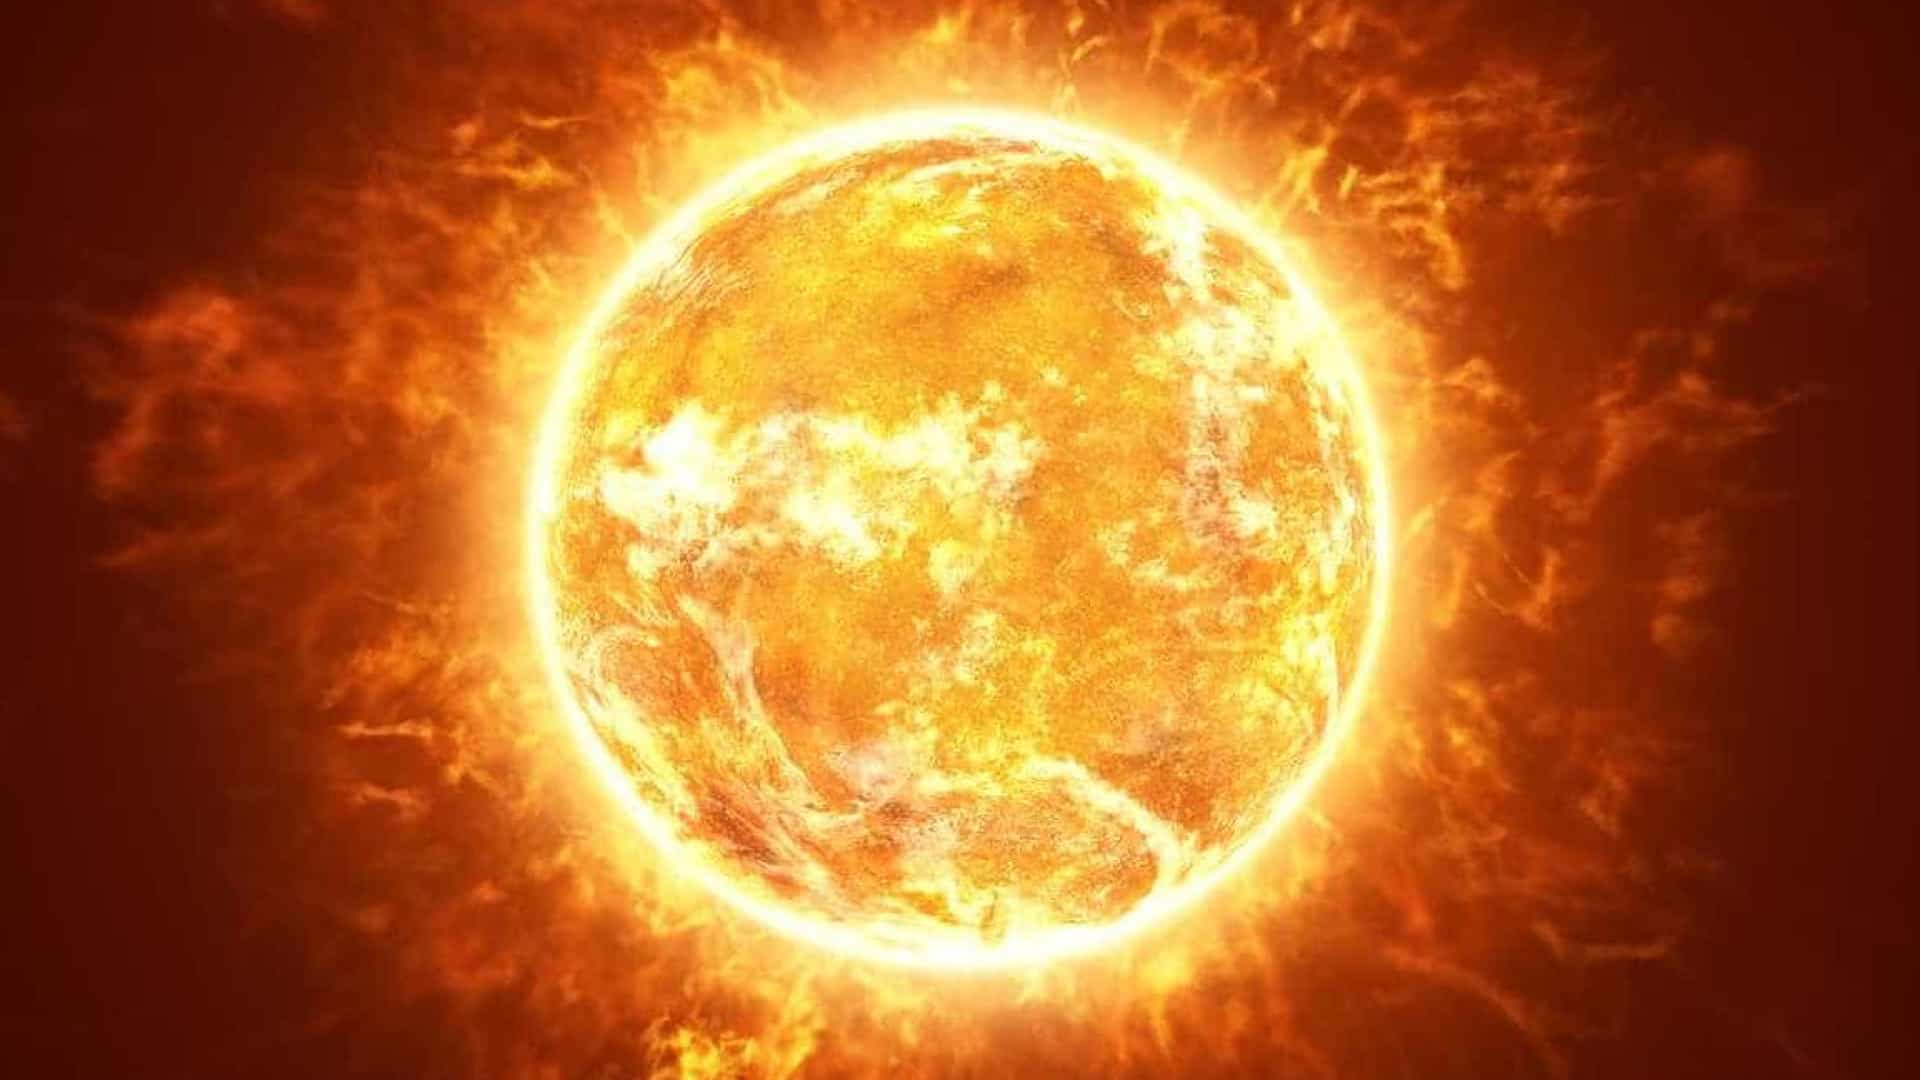 Como seria se ouvíssemos o Sol? Seria 'extraordinariamente alto'!